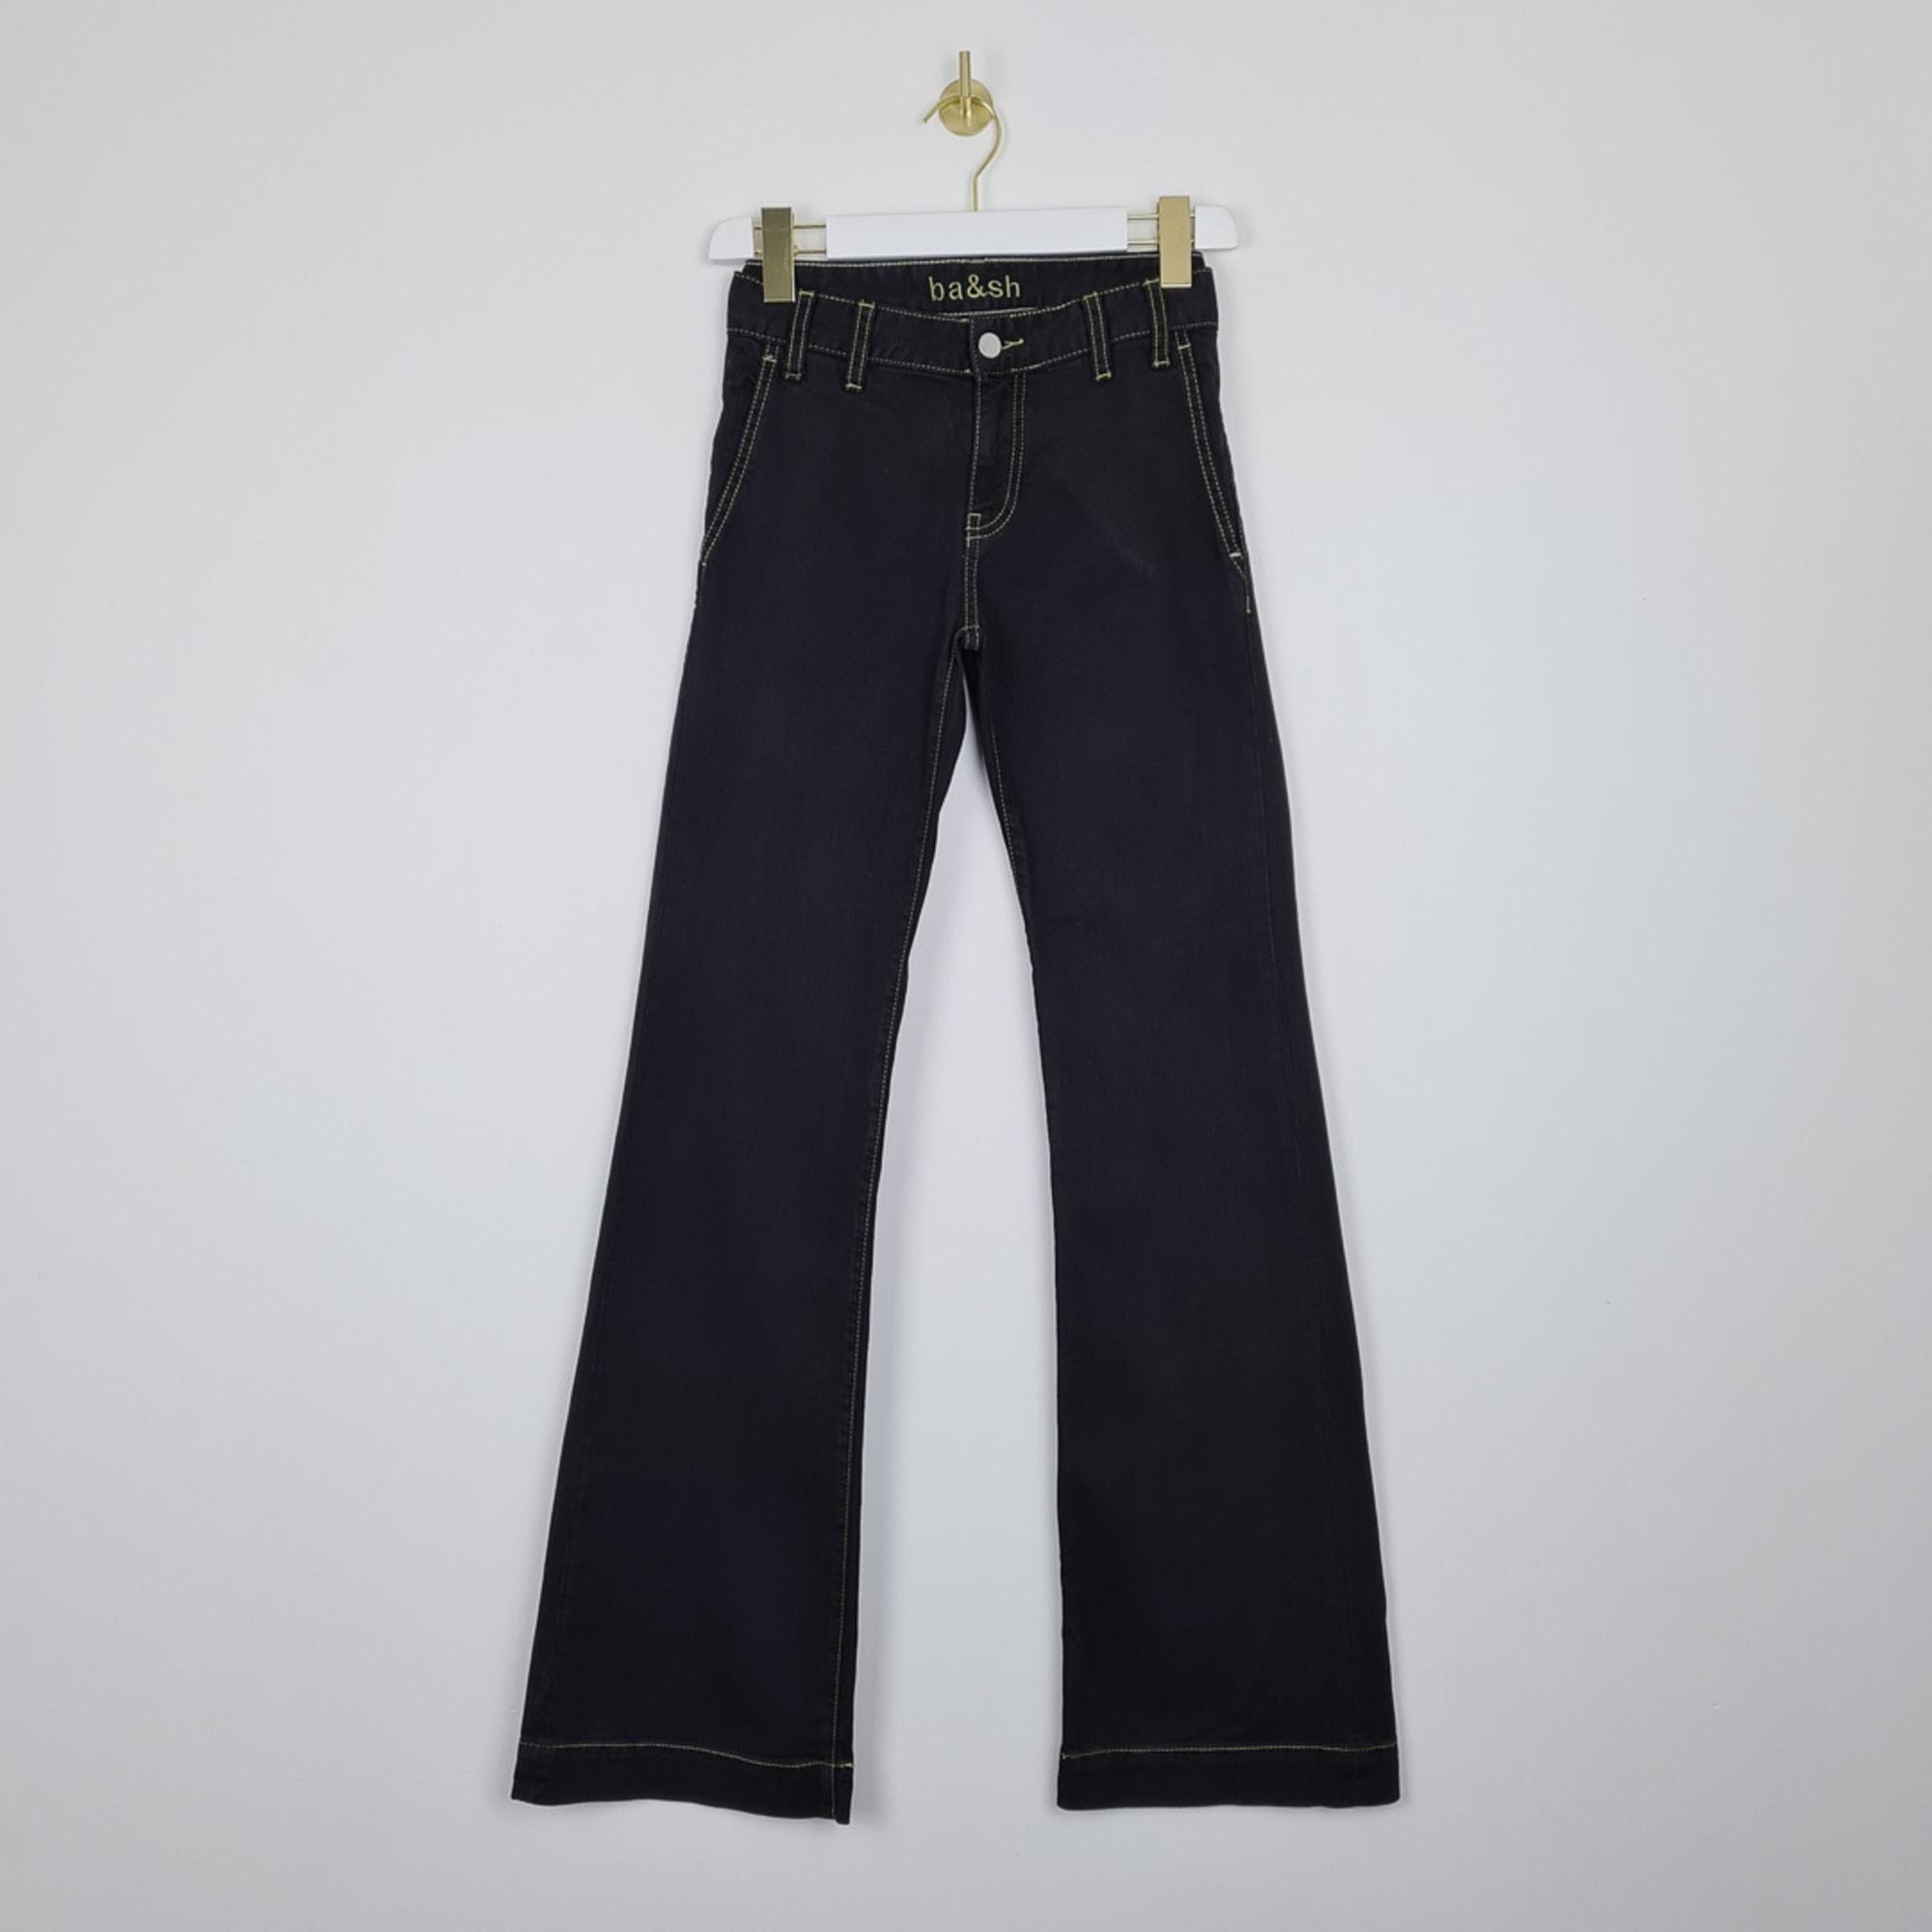 Jeans évasé, boot-cut BA&SH Noir